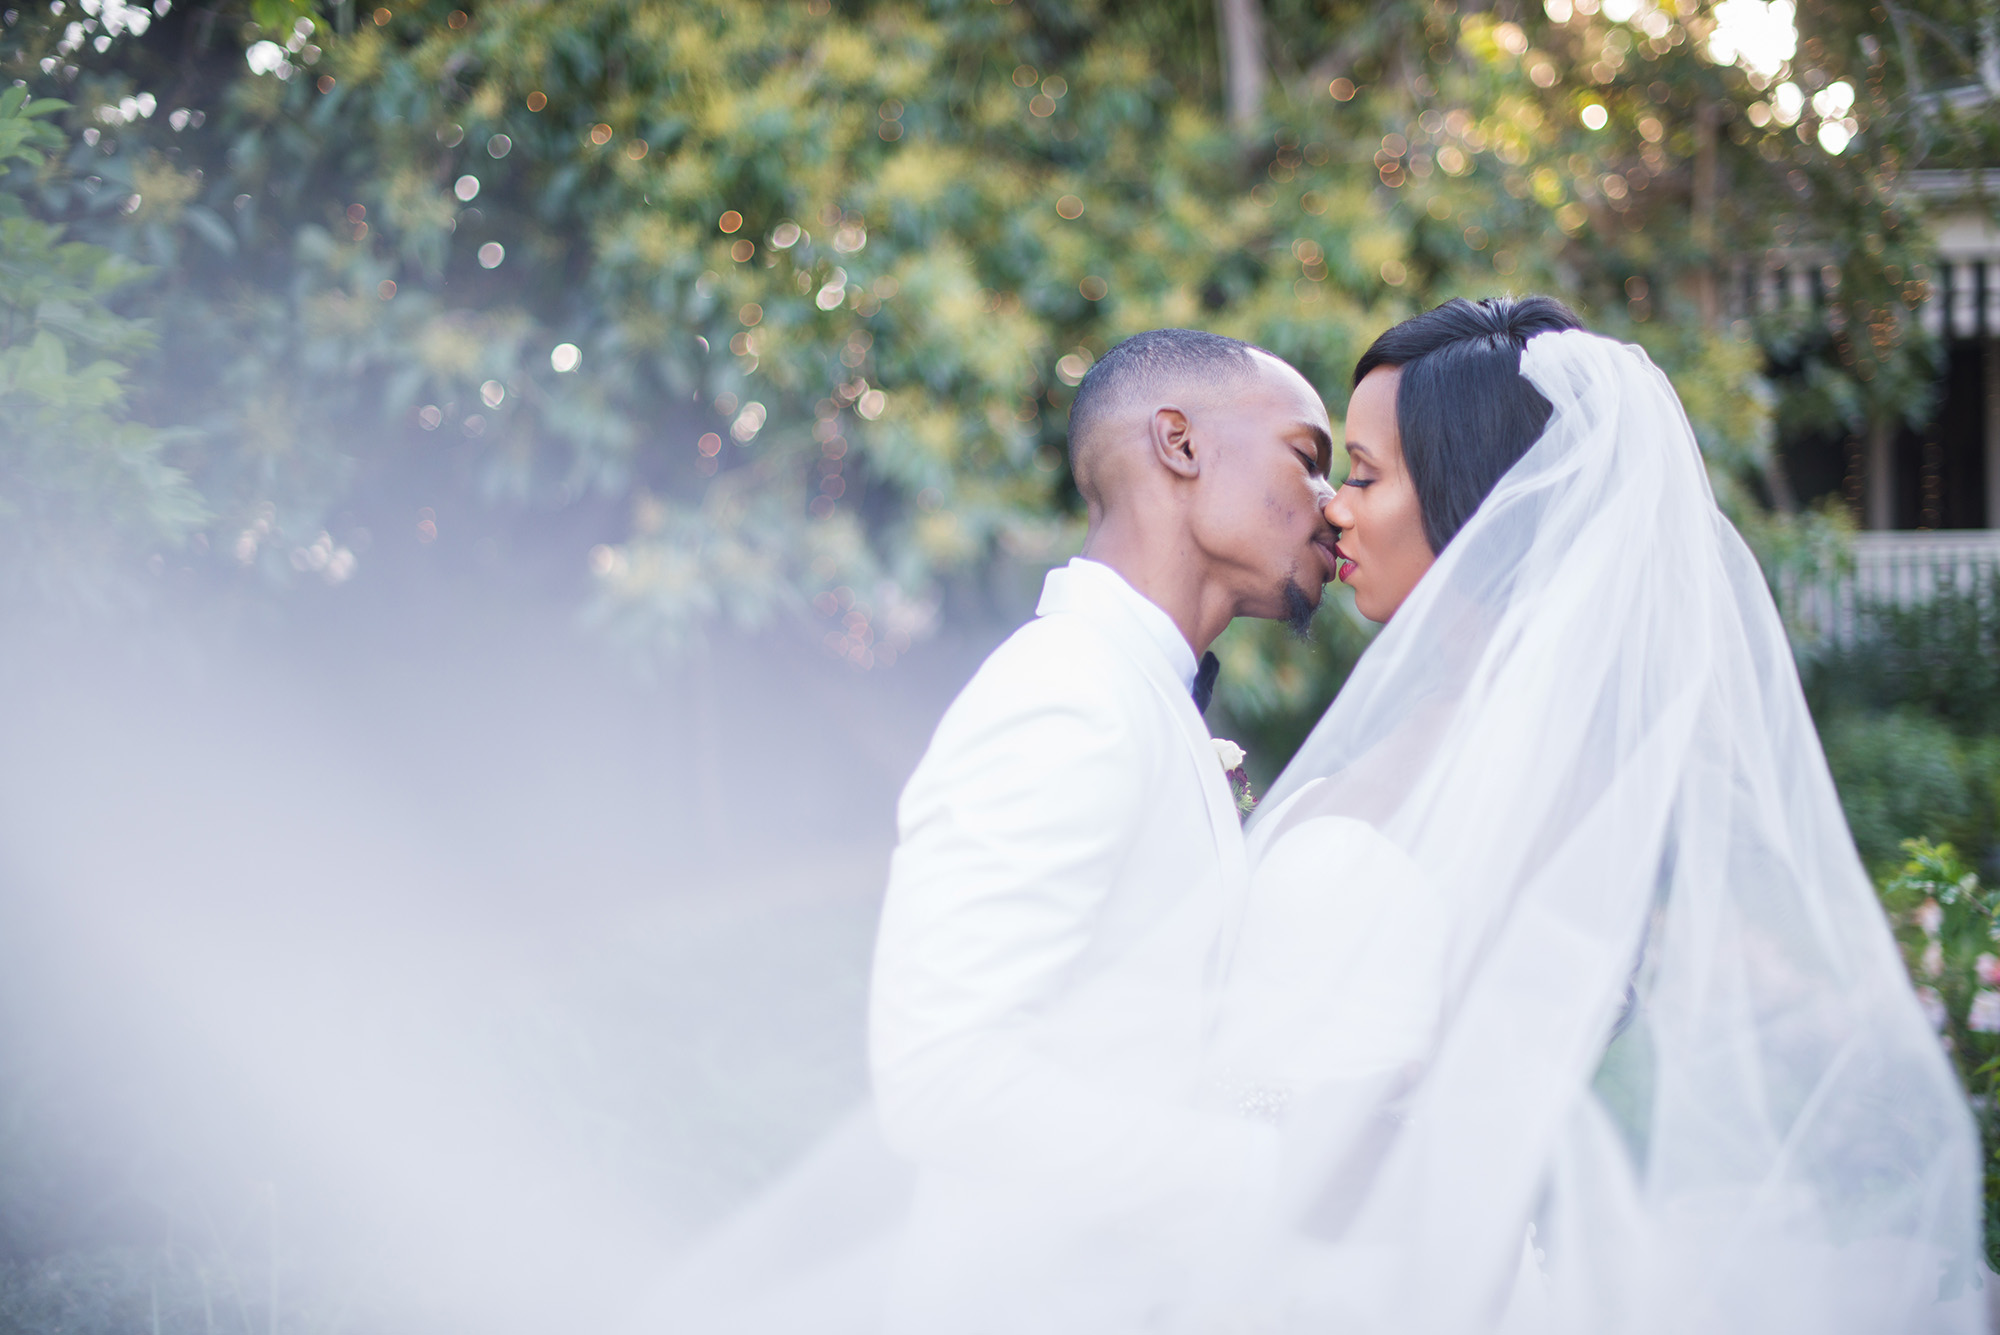 associate-photographer-christmas-house-wedding-carrie-vines-0040.jpg